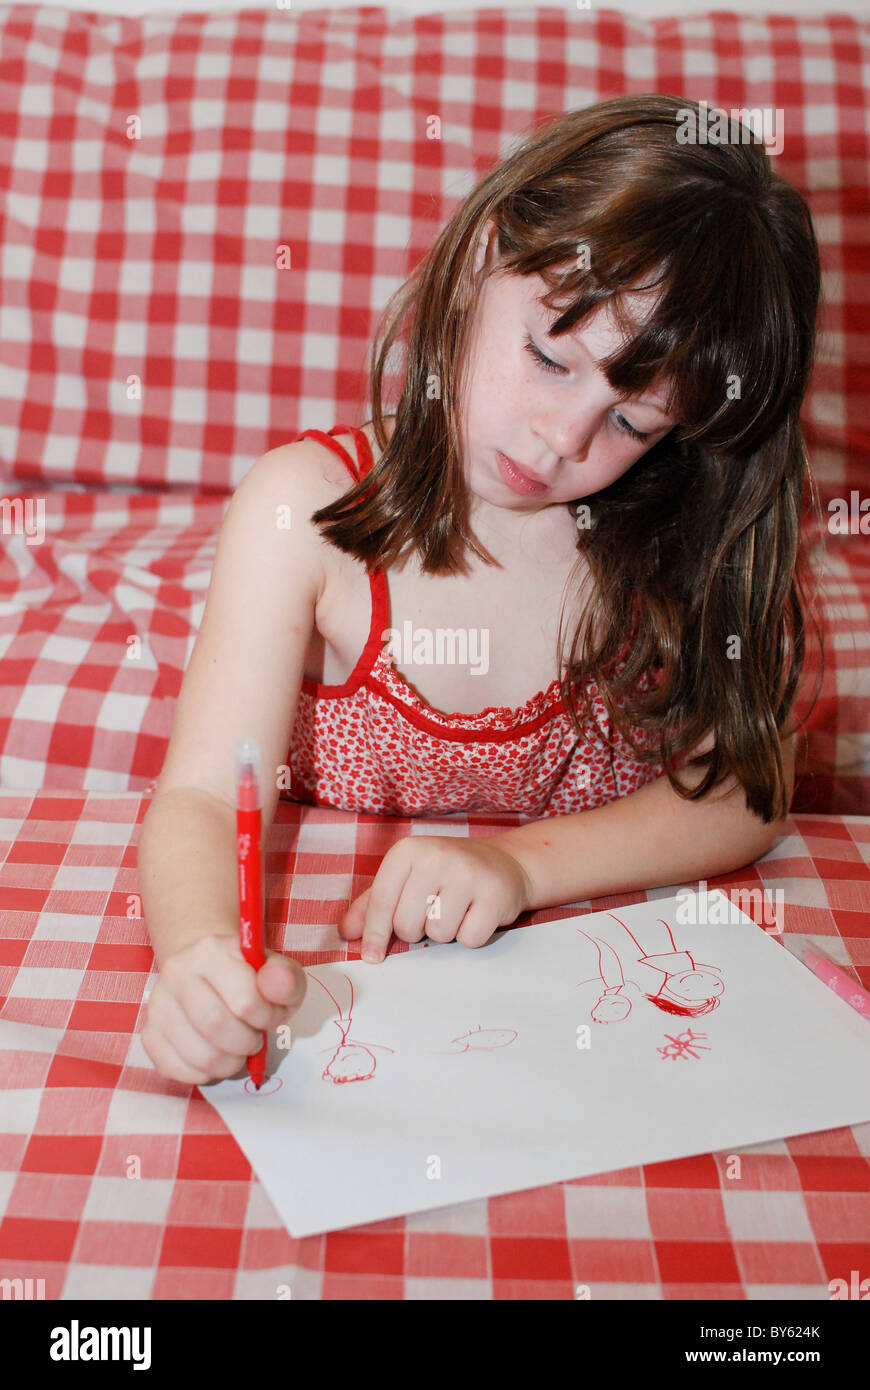 Young preschool girl of 5 drawing - Stock Image